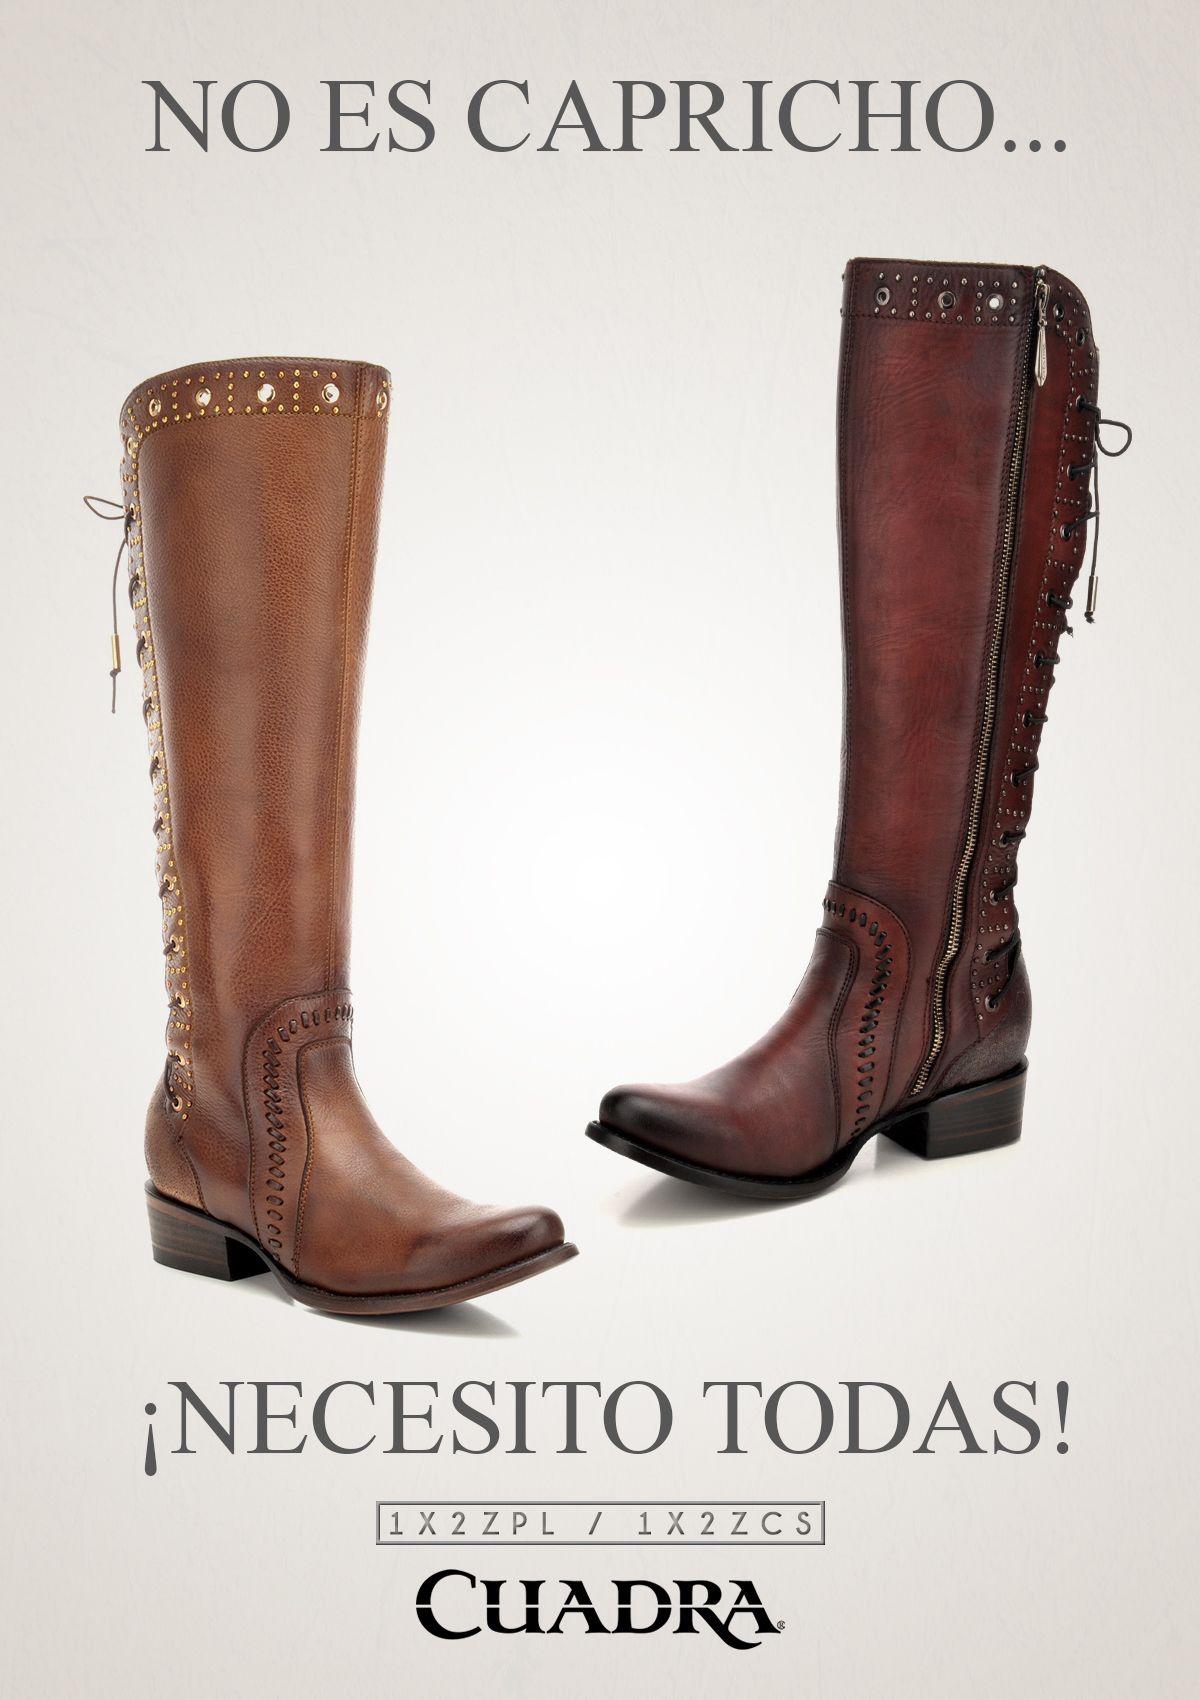 b0b27365b Solo nosotras entendemos.  moda  botas  boots  womensfashion  frases ...